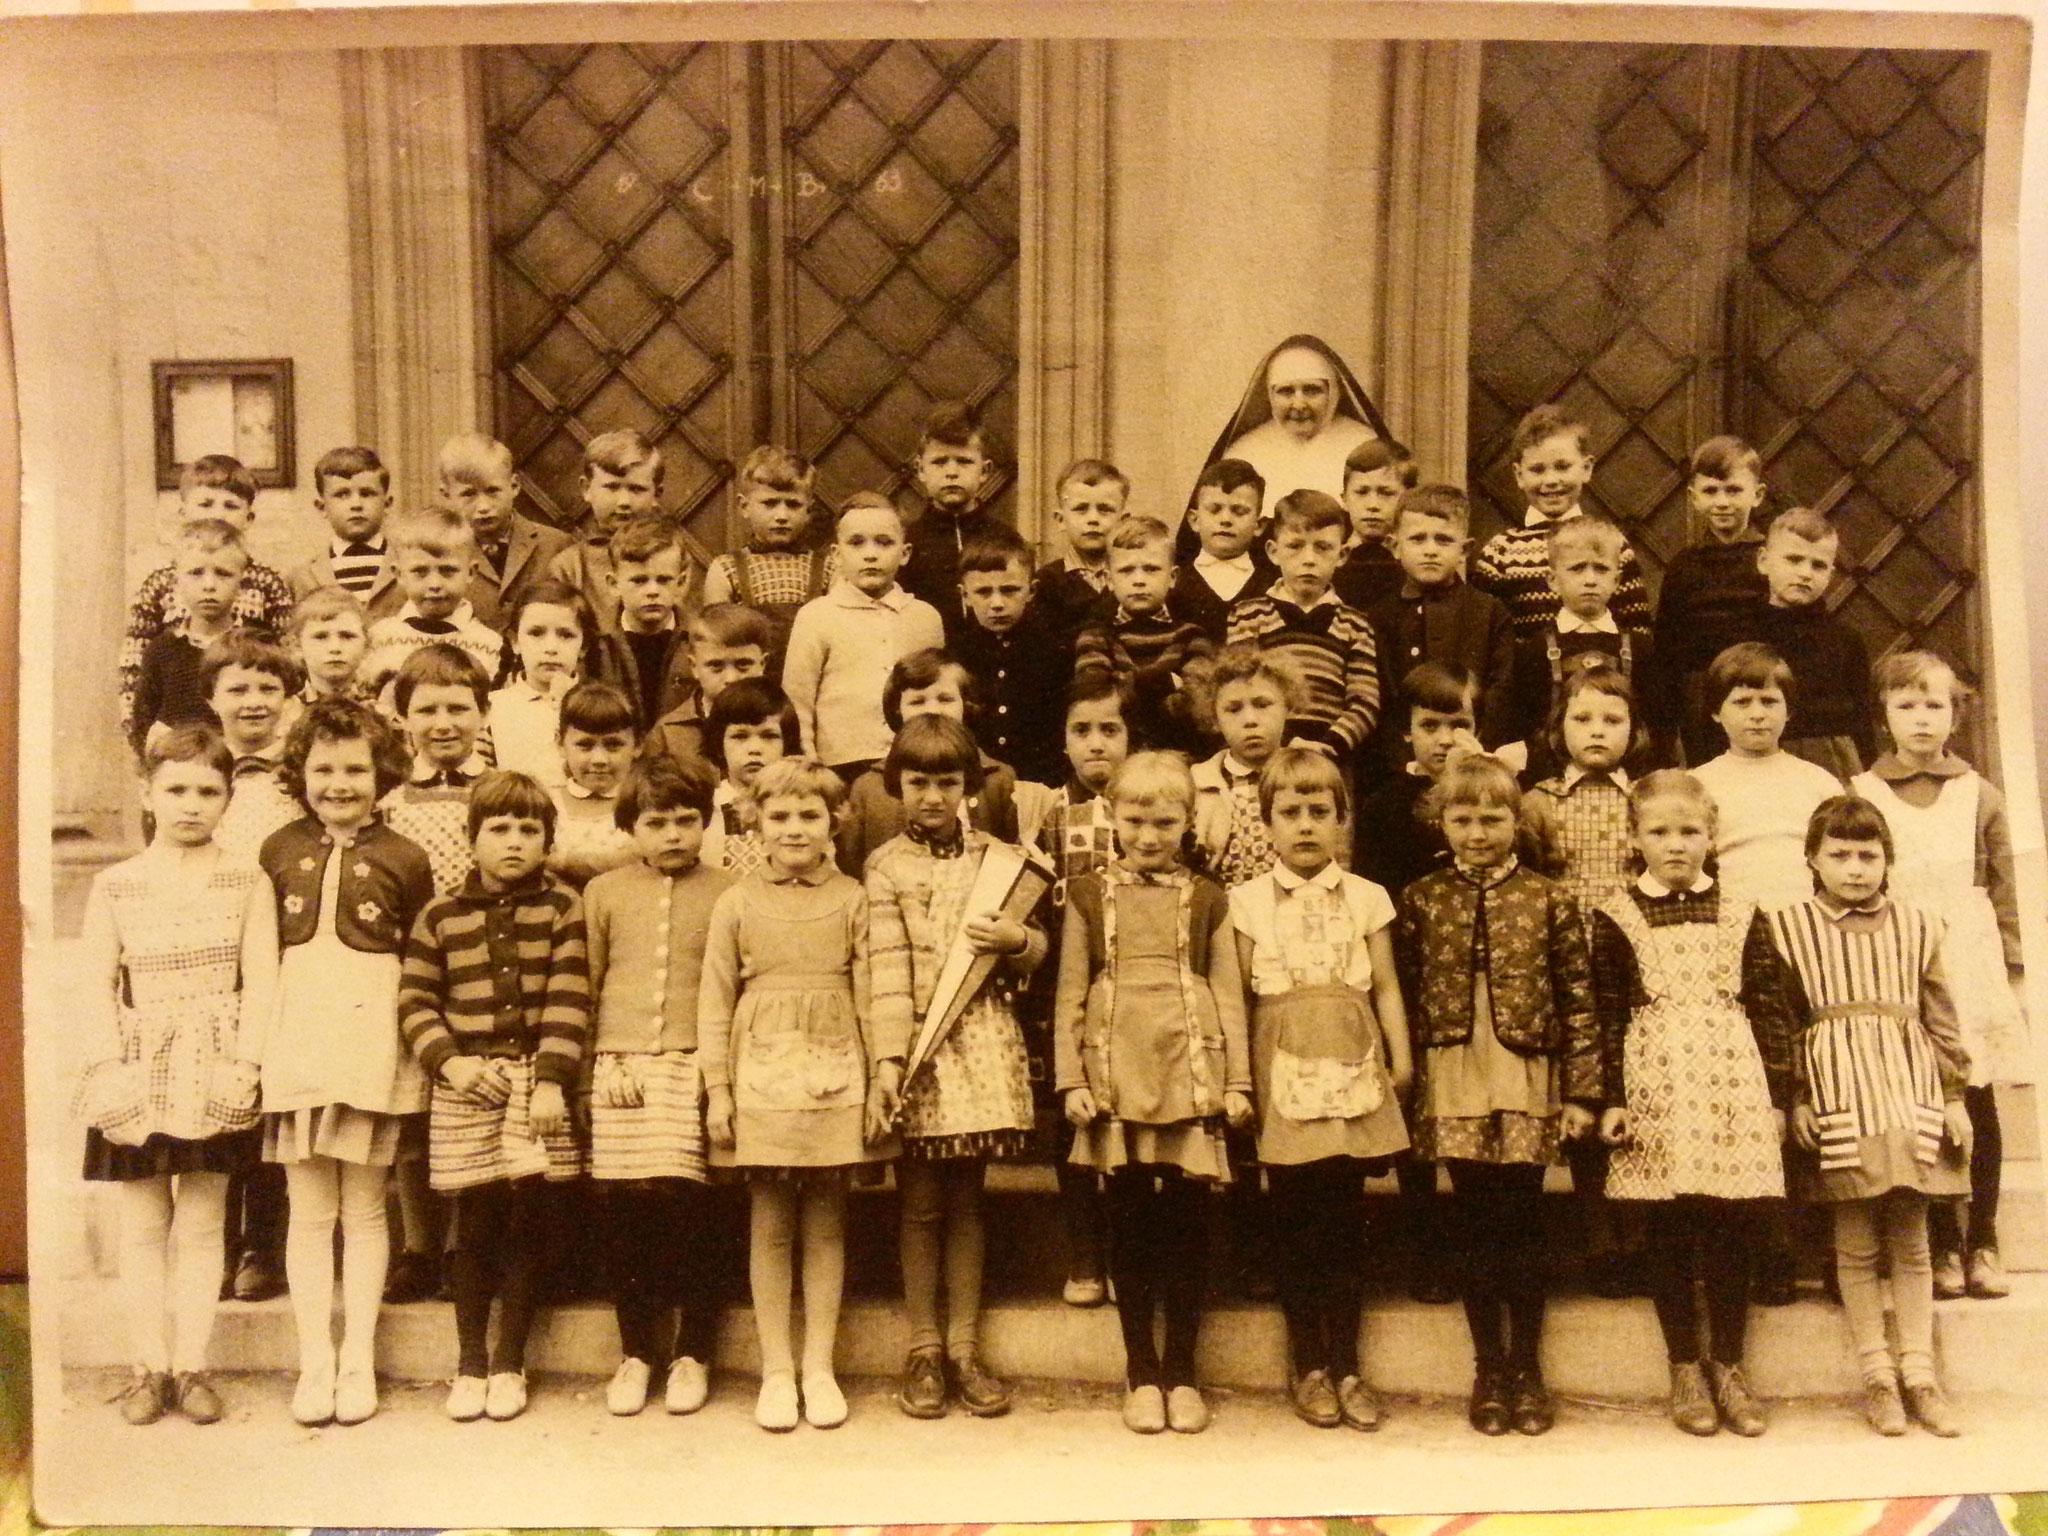 Schwester Clarisa mit Schuljahrgang 1963, Geburtsjahrgang 1956